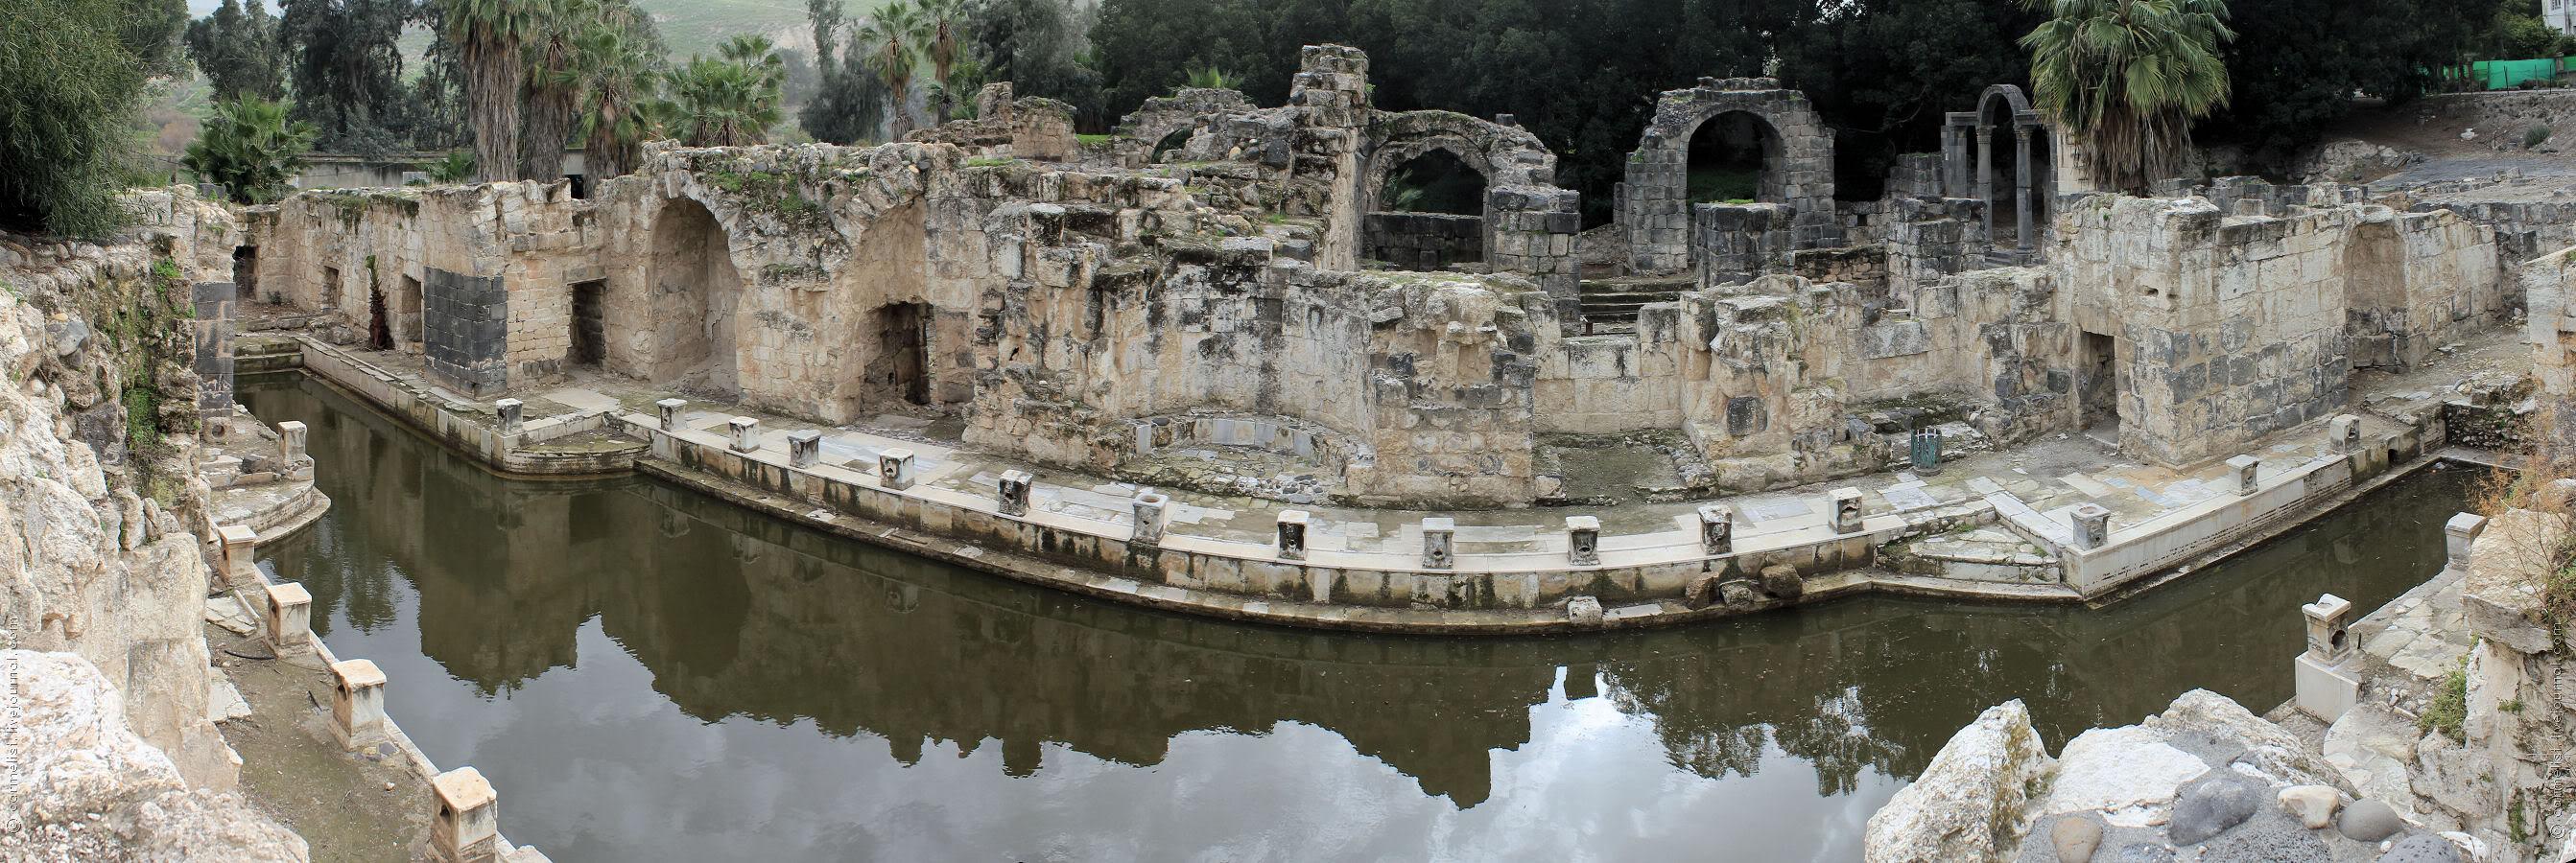 Хамат-Гадер, раскопки